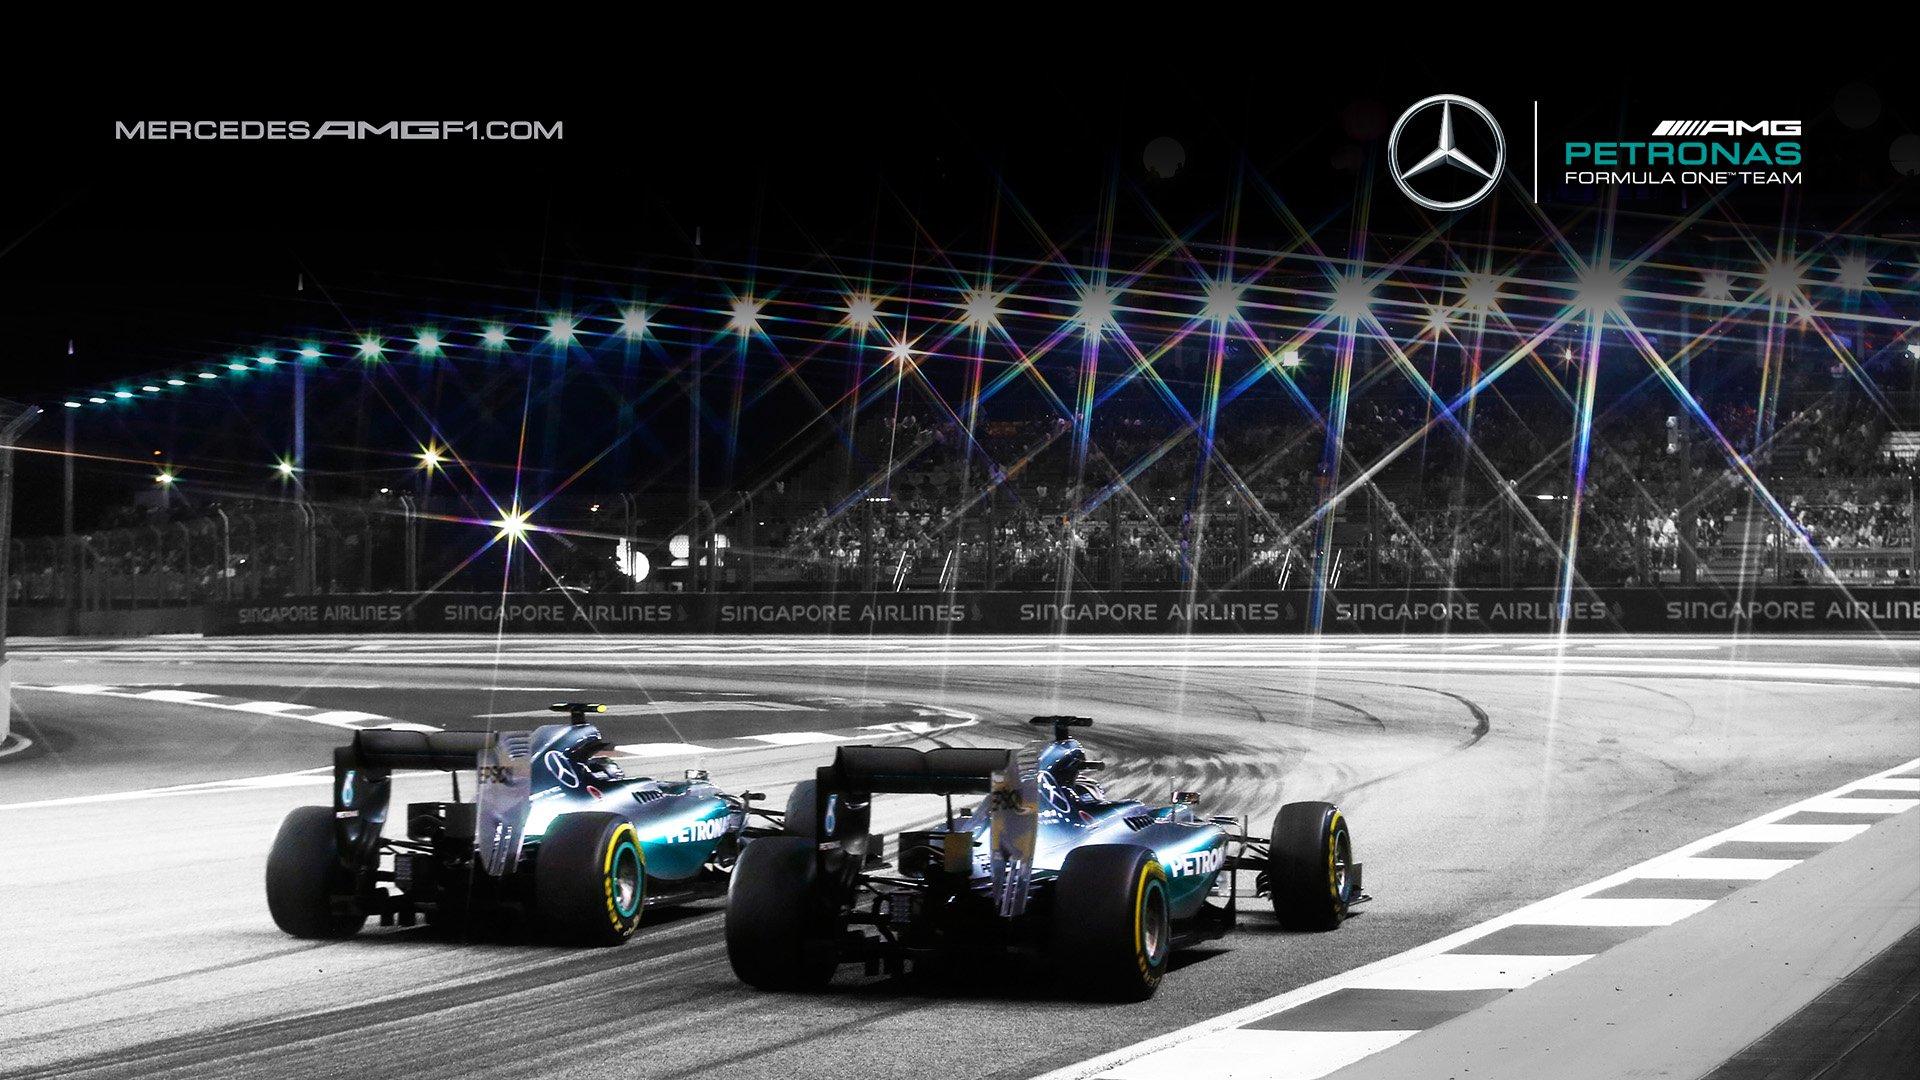 Video inside a mercedes amg f1 hybrid power unit image 443666 for Mercedes benz petronas